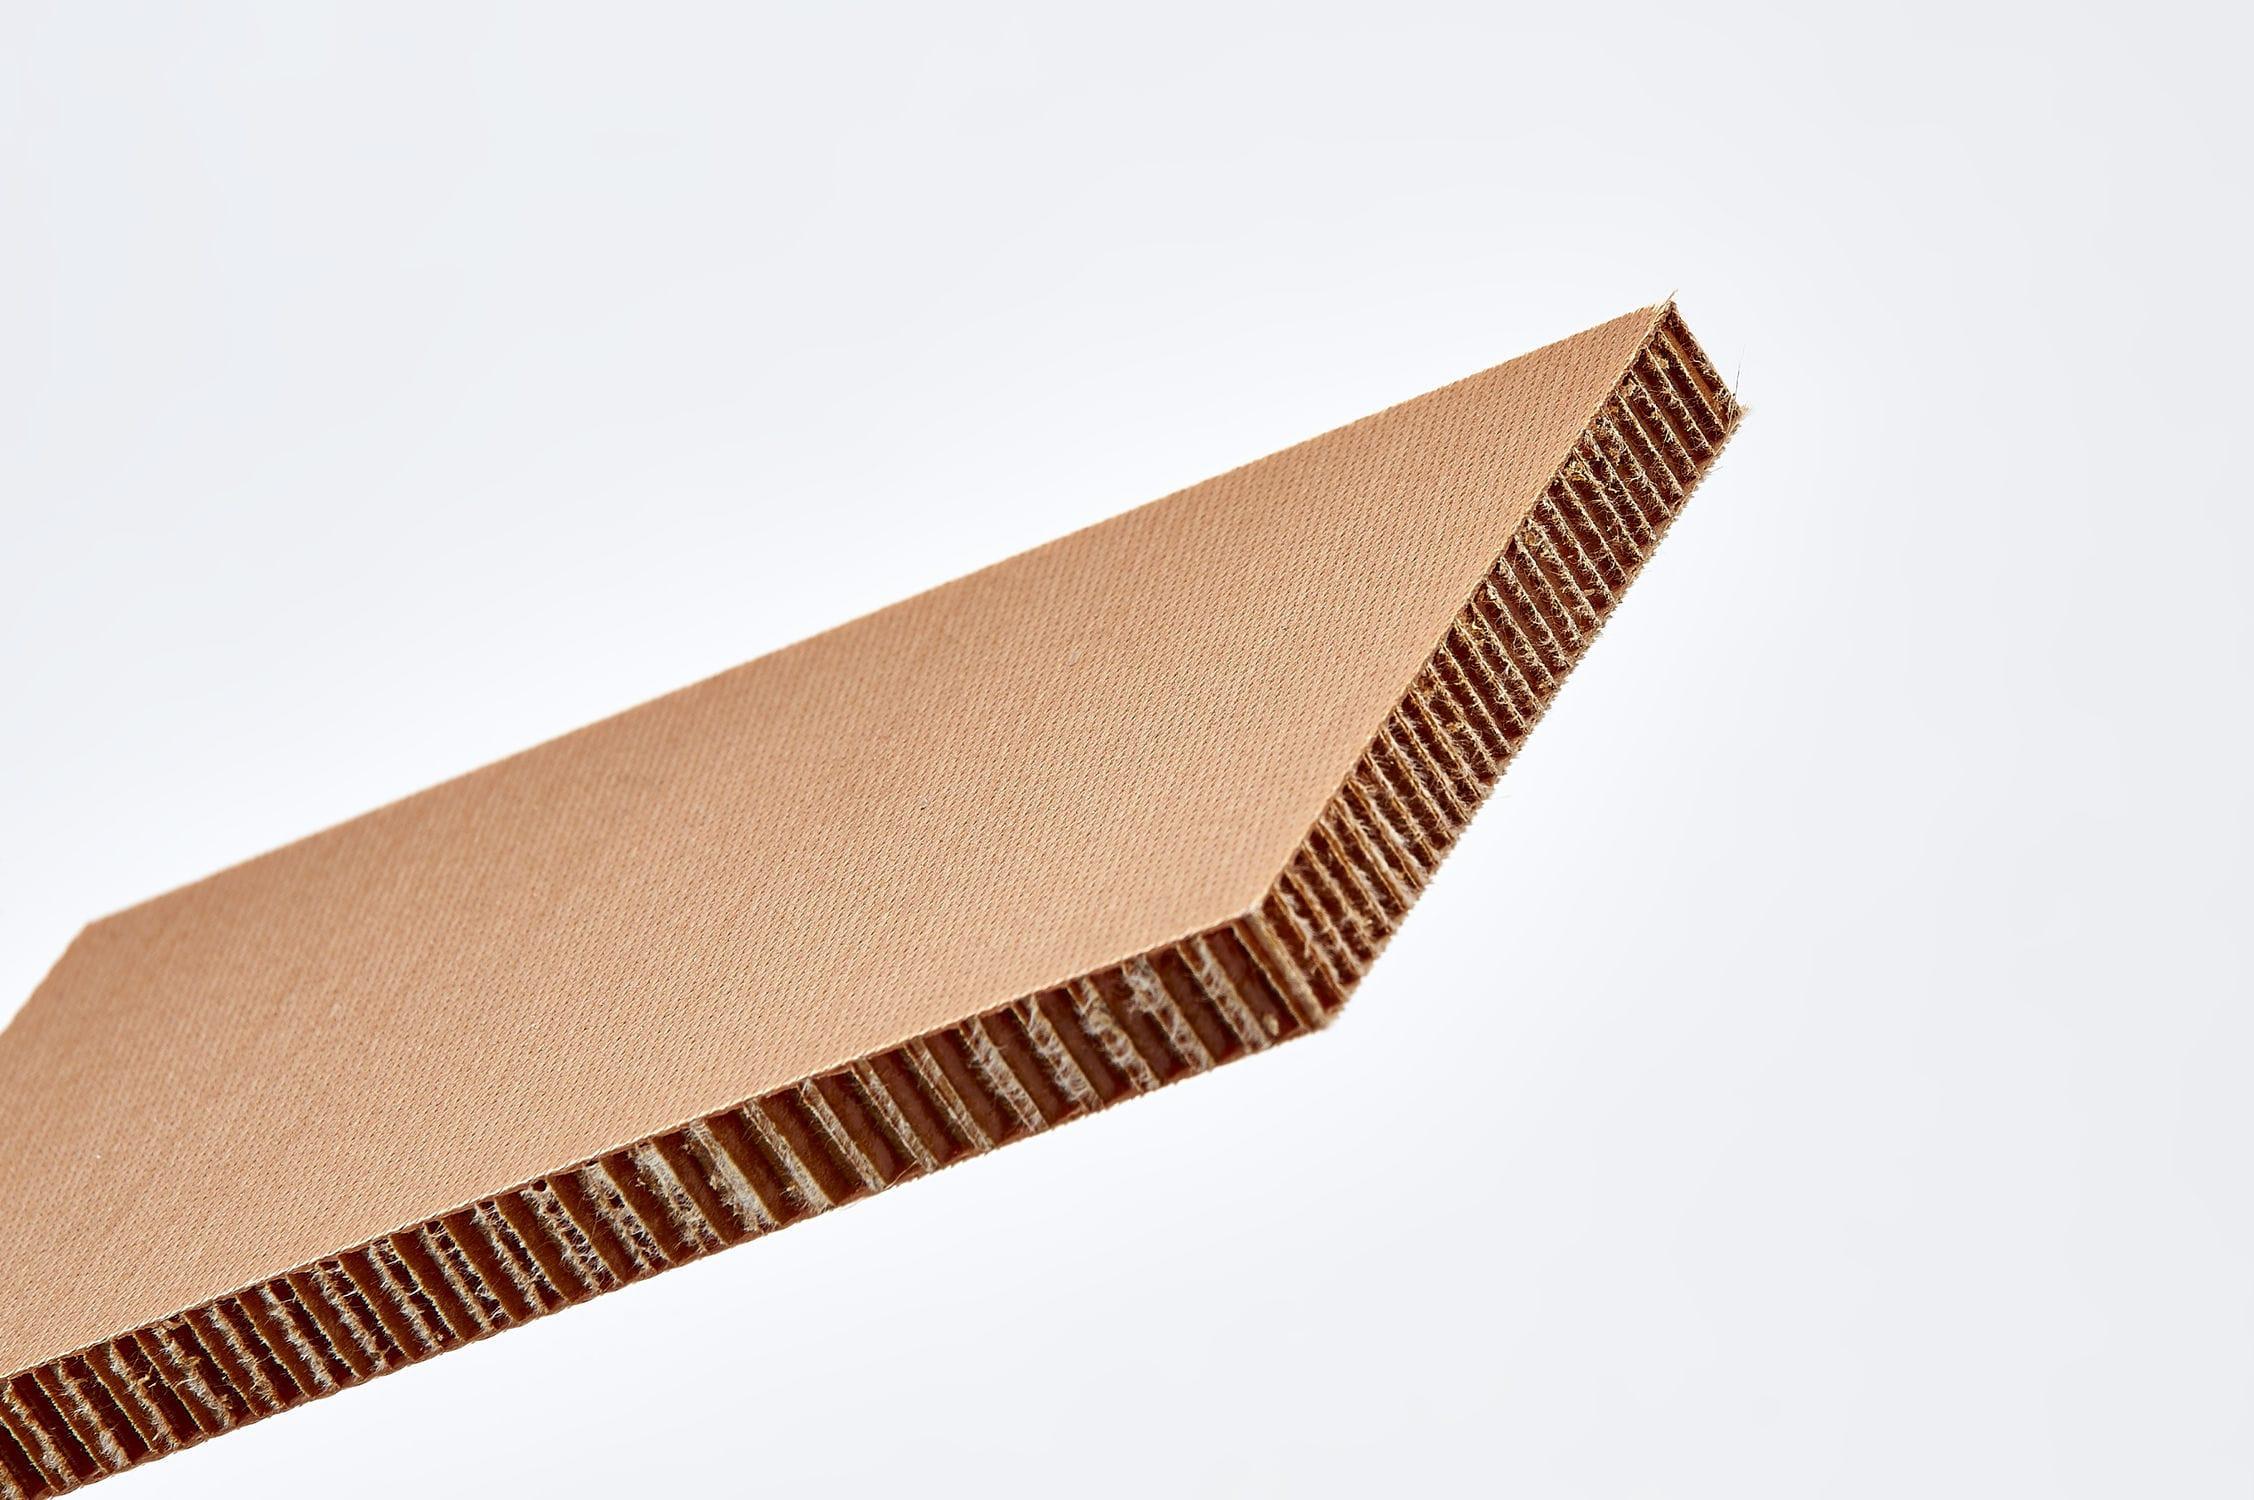 ... seat sandwich panel / fiberglass facing / aramid paper honeycomb core / for doors & Seat sandwich panel / fiberglass facing / aramid paper honeycomb ...